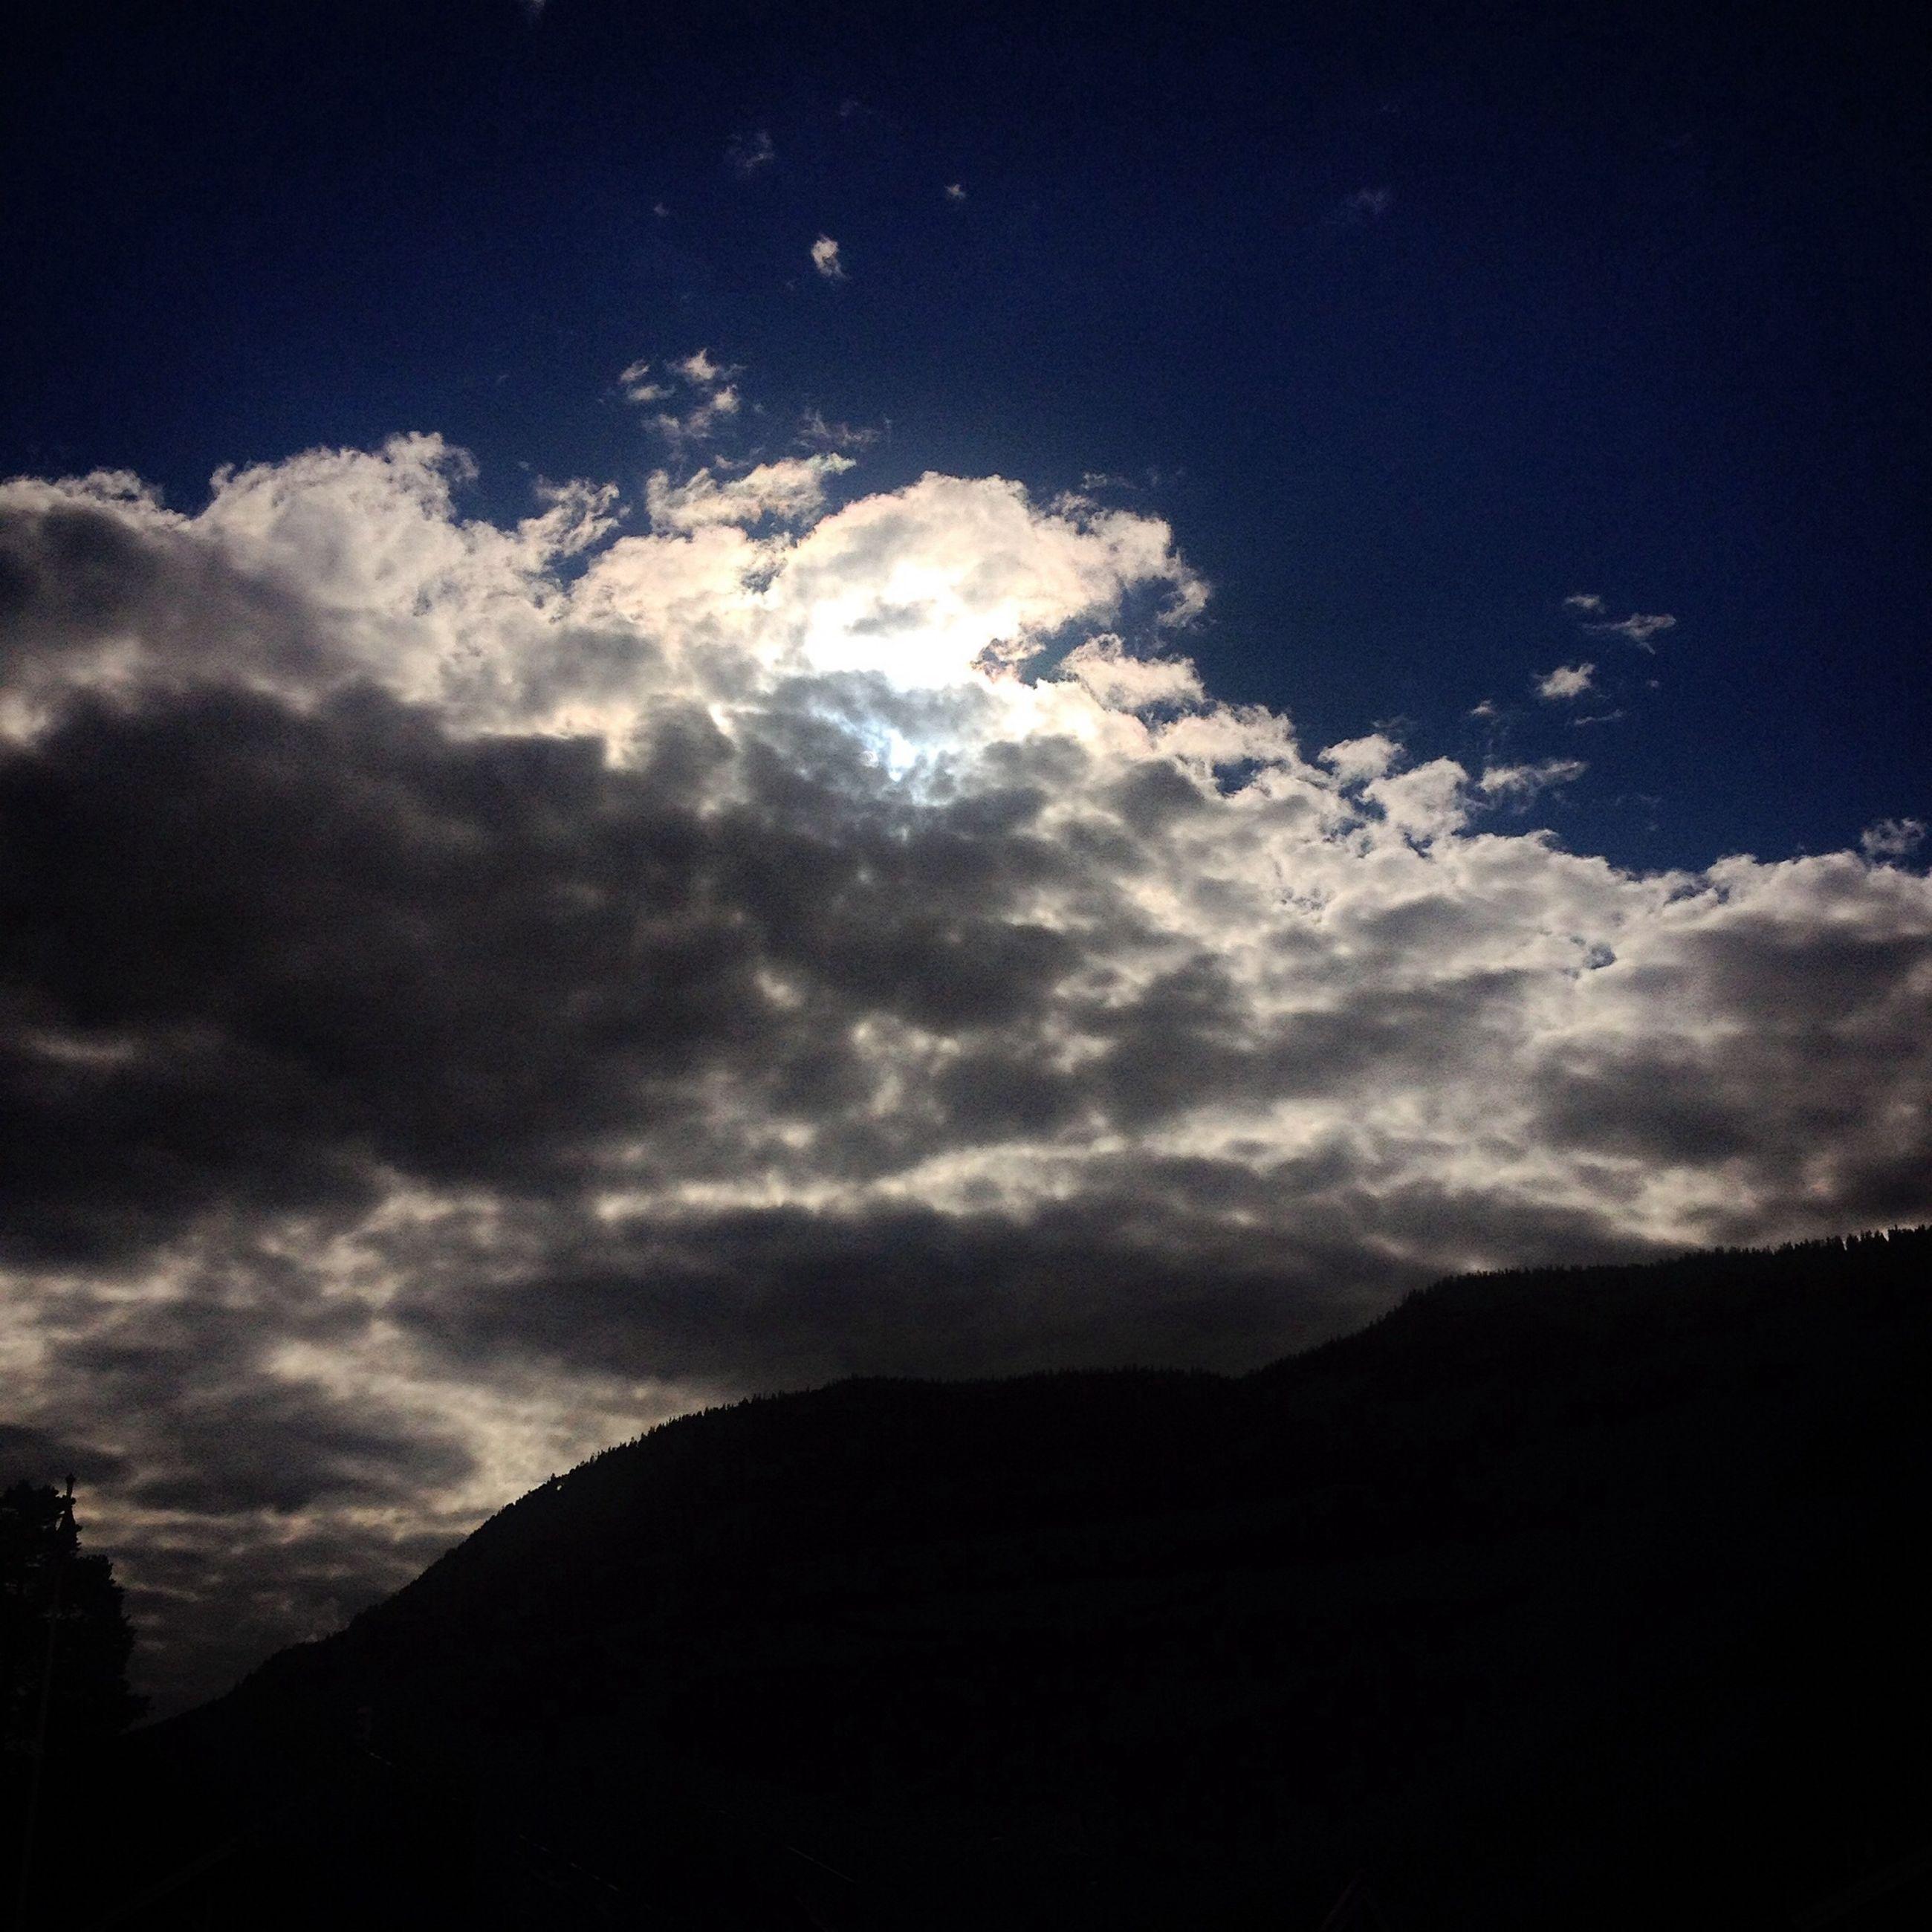 mountain, scenics, sky, tranquil scene, tranquility, beauty in nature, silhouette, cloud - sky, mountain range, nature, cloudy, cloud, landscape, idyllic, majestic, dusk, weather, non-urban scene, outdoors, dark